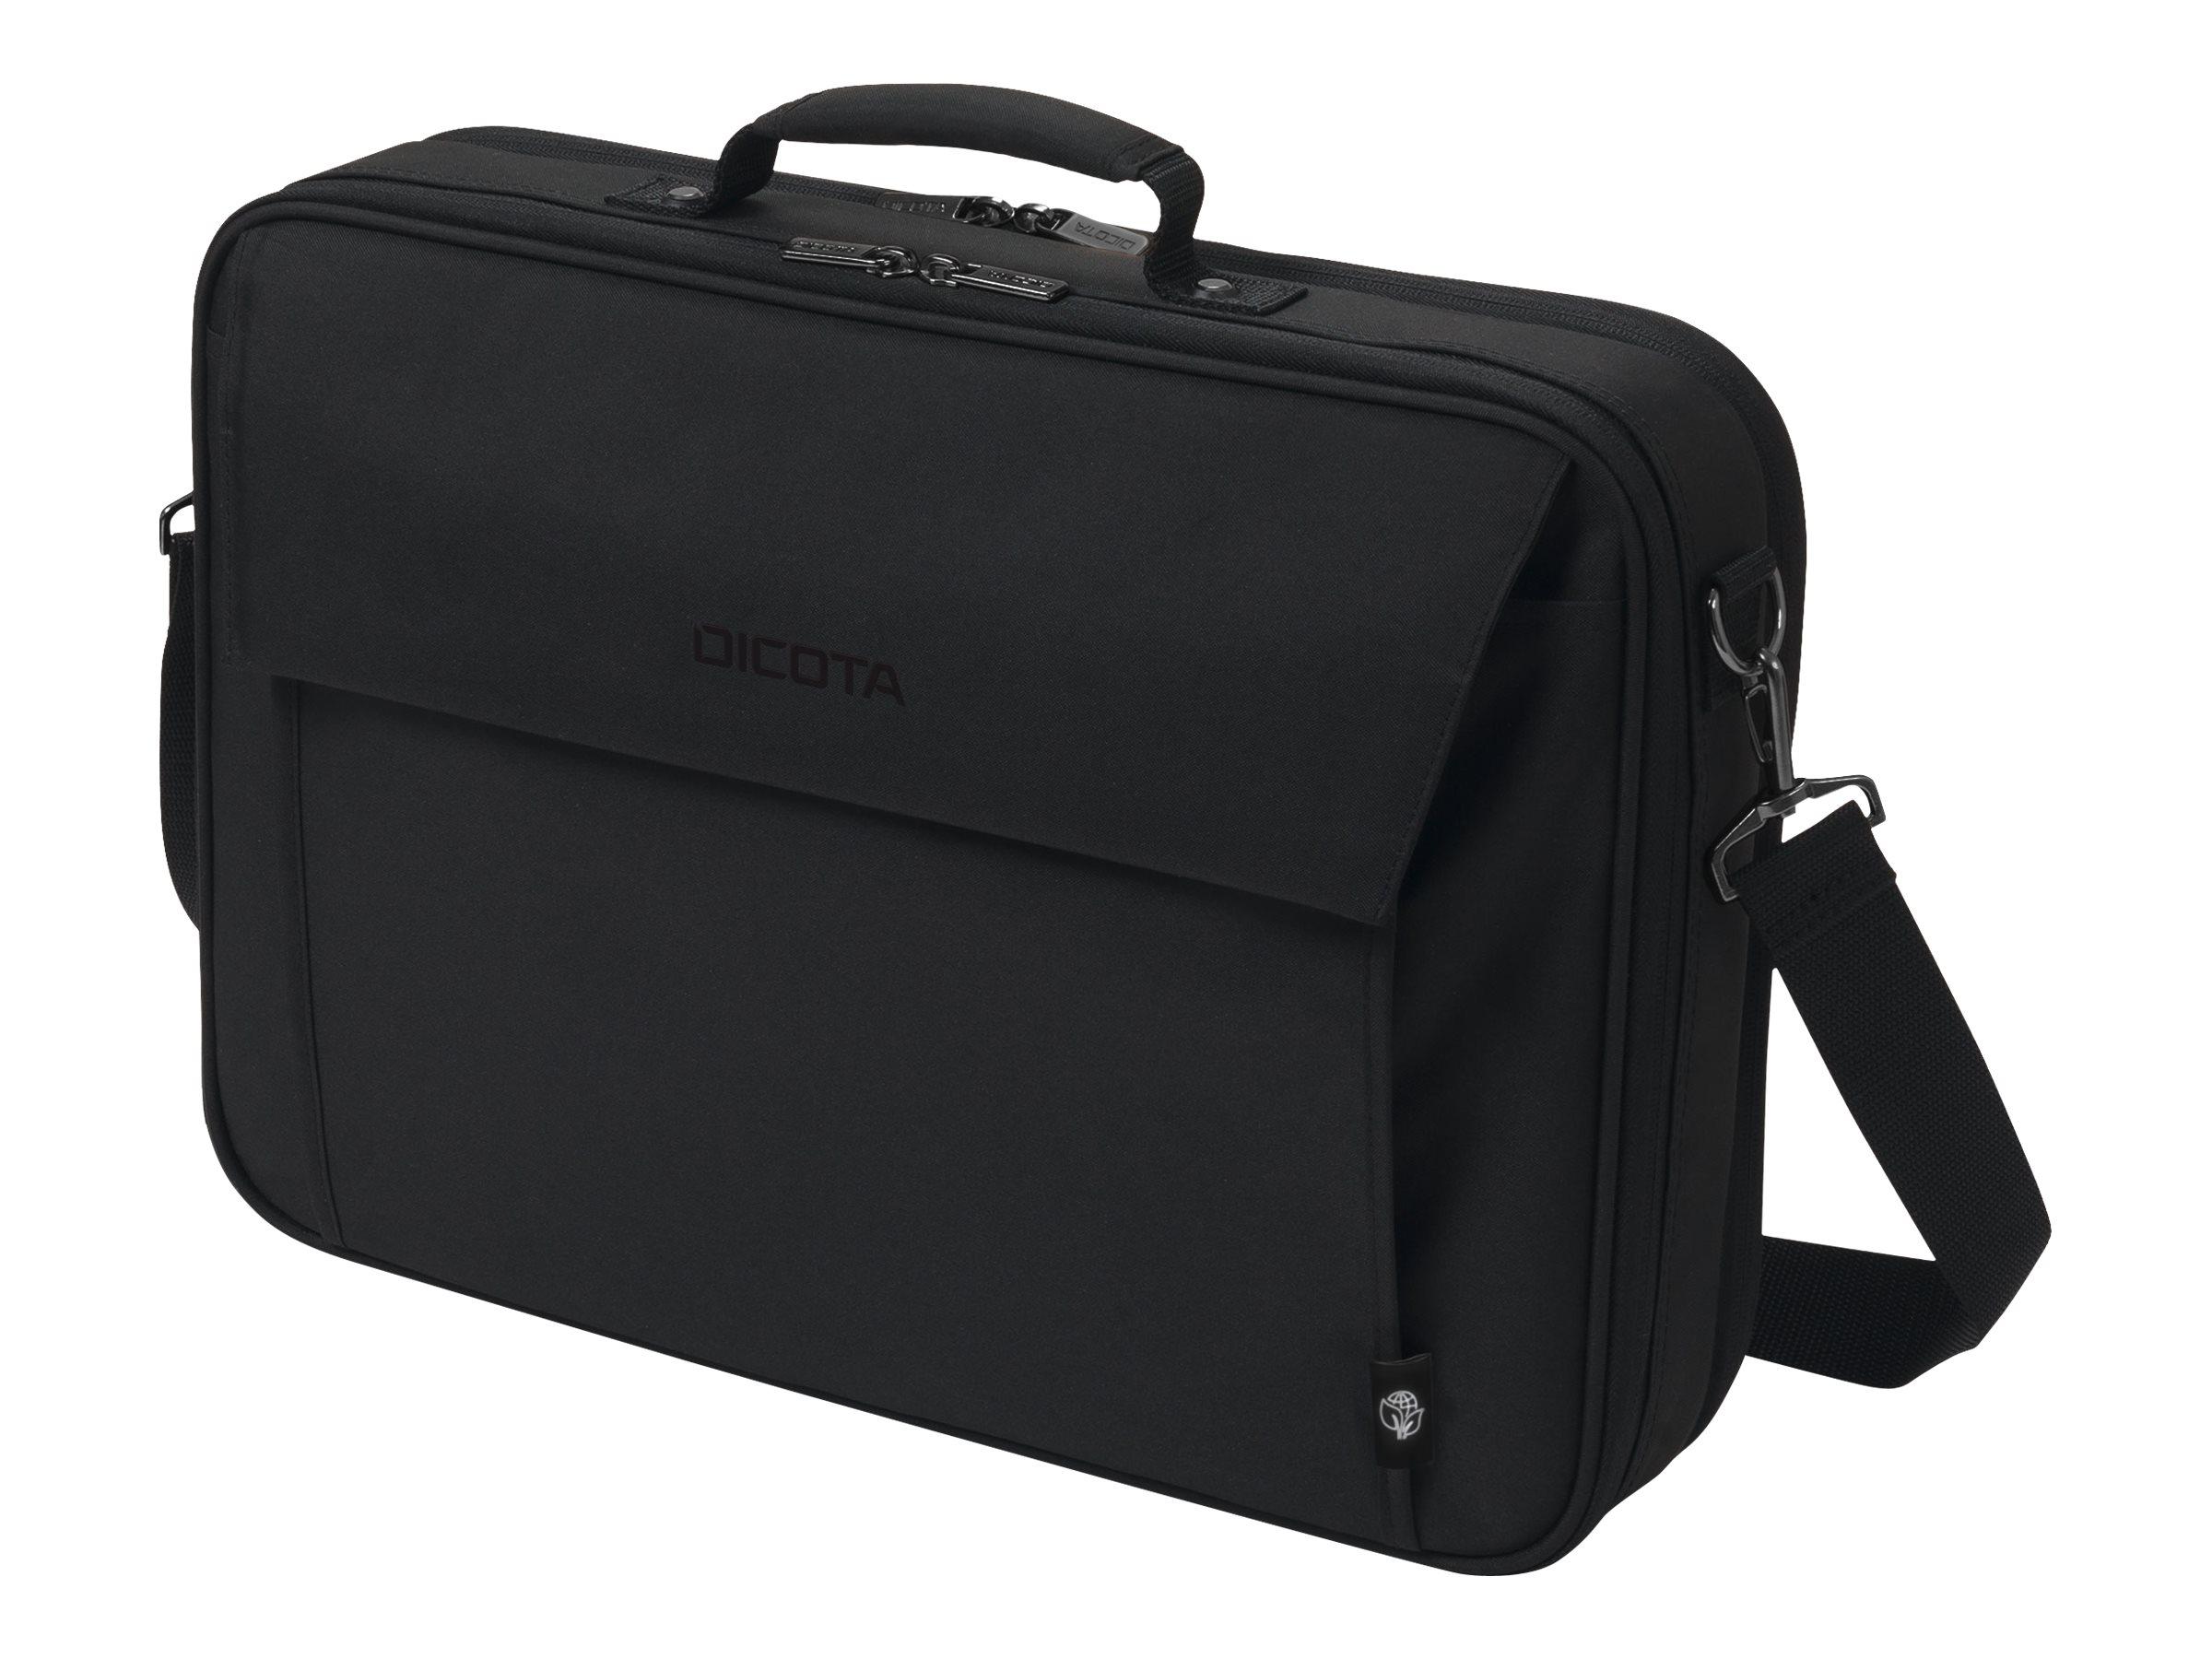 Dicota Eco Multi BASE - Notebook-Tasche - 43.9 cm